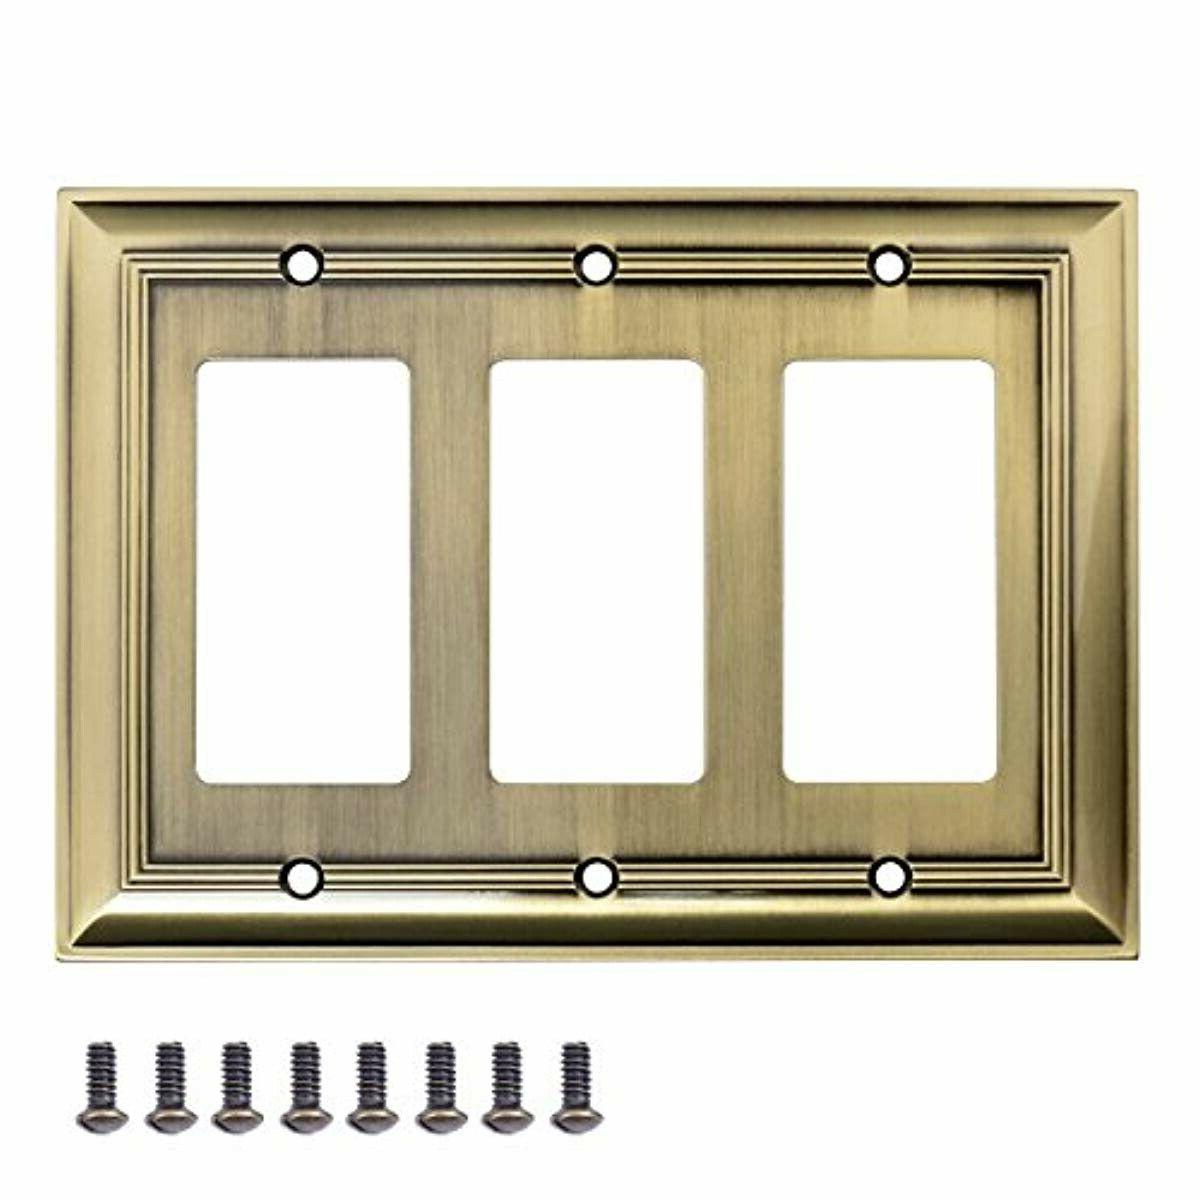 triple gang wall plate antique brass 1